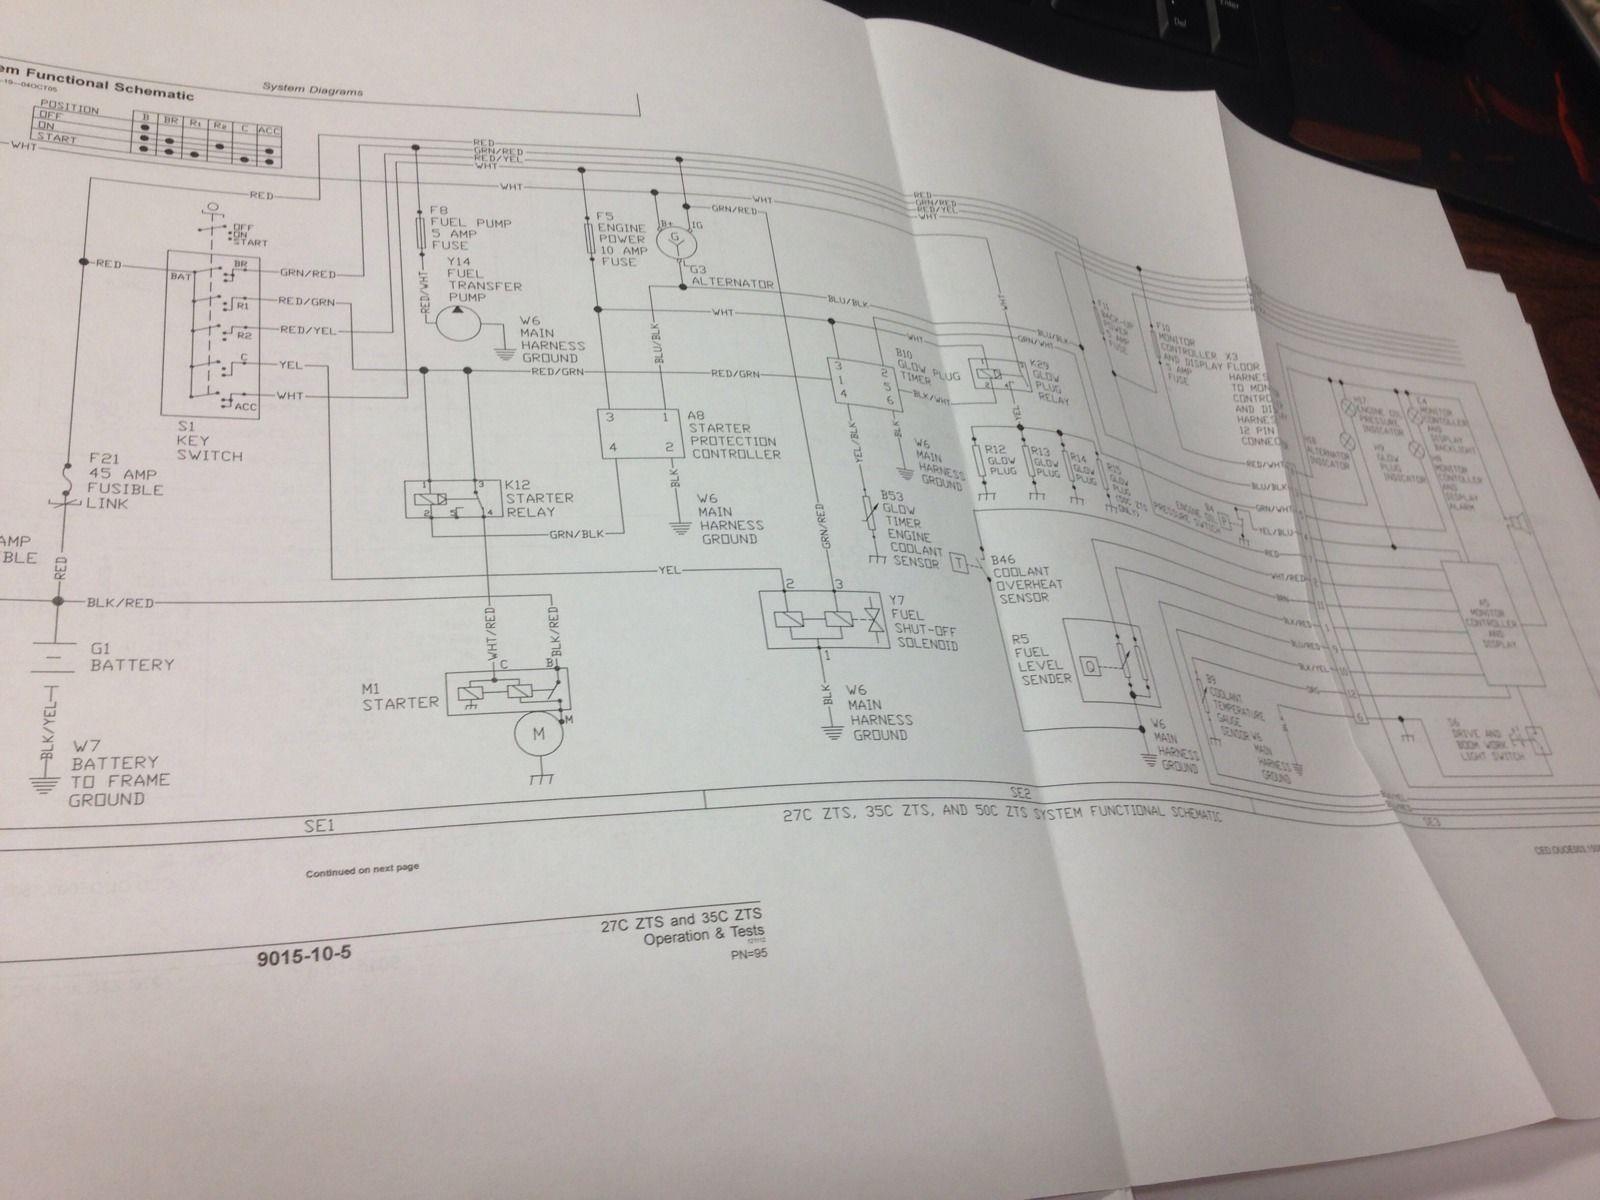 John Deere Jd 27c Zts 35c Excavator Technical Operation Test 350 Wiring Diagram Manual Tm2052